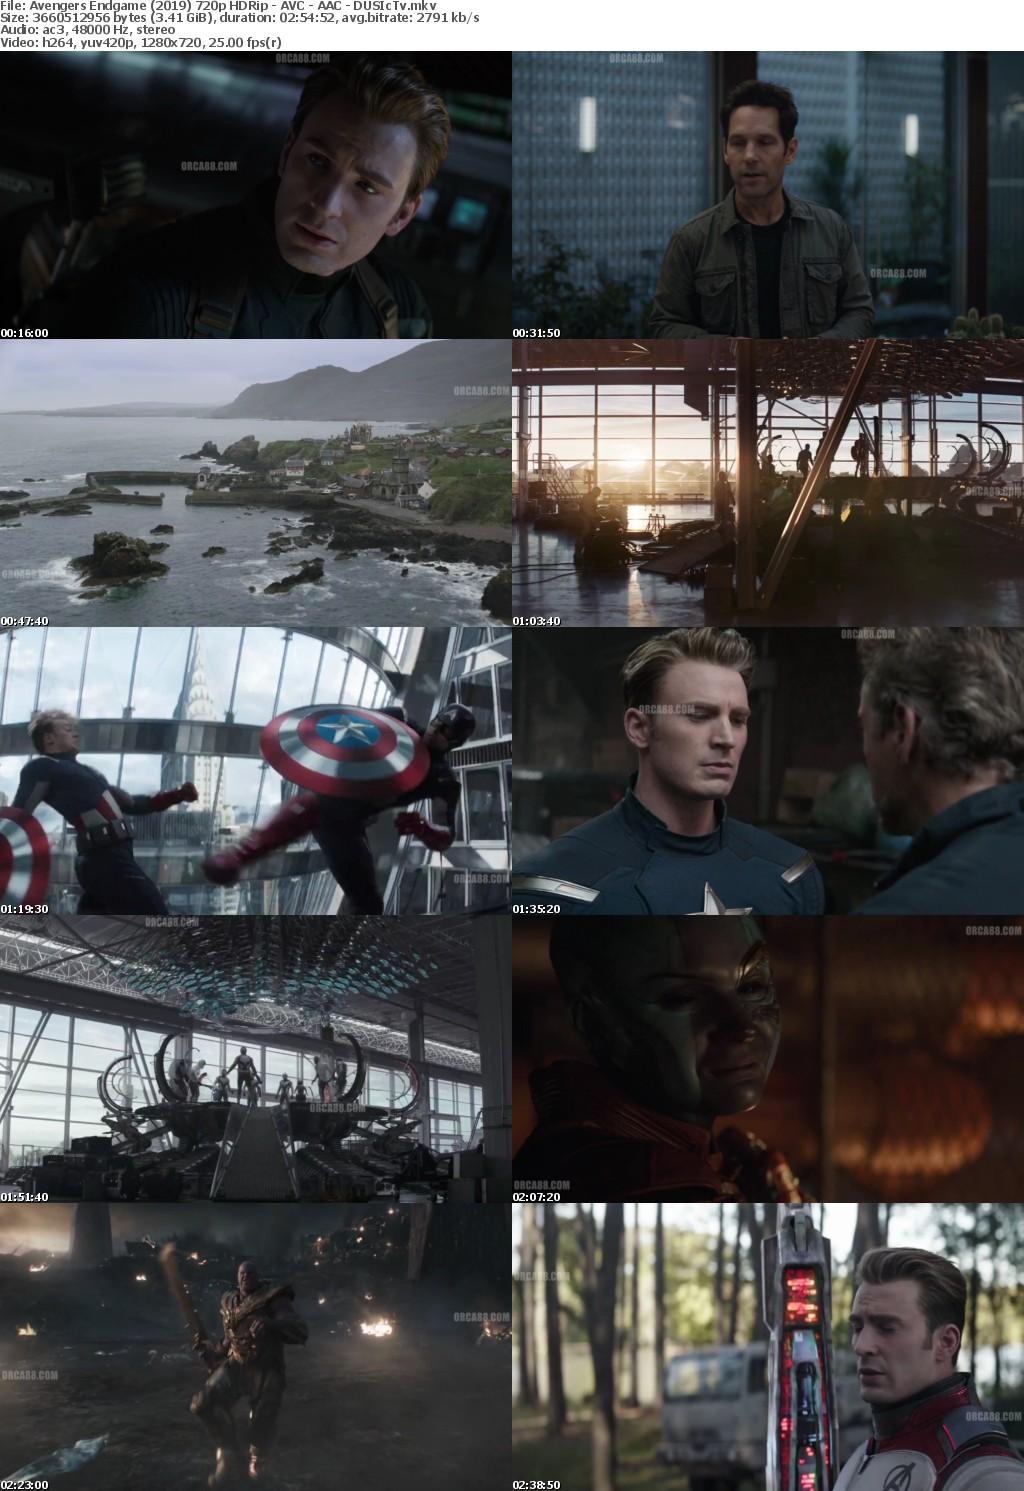 Avengers Endgame (2019) 720p HDRip - AVC - AAC - DUSIcTv